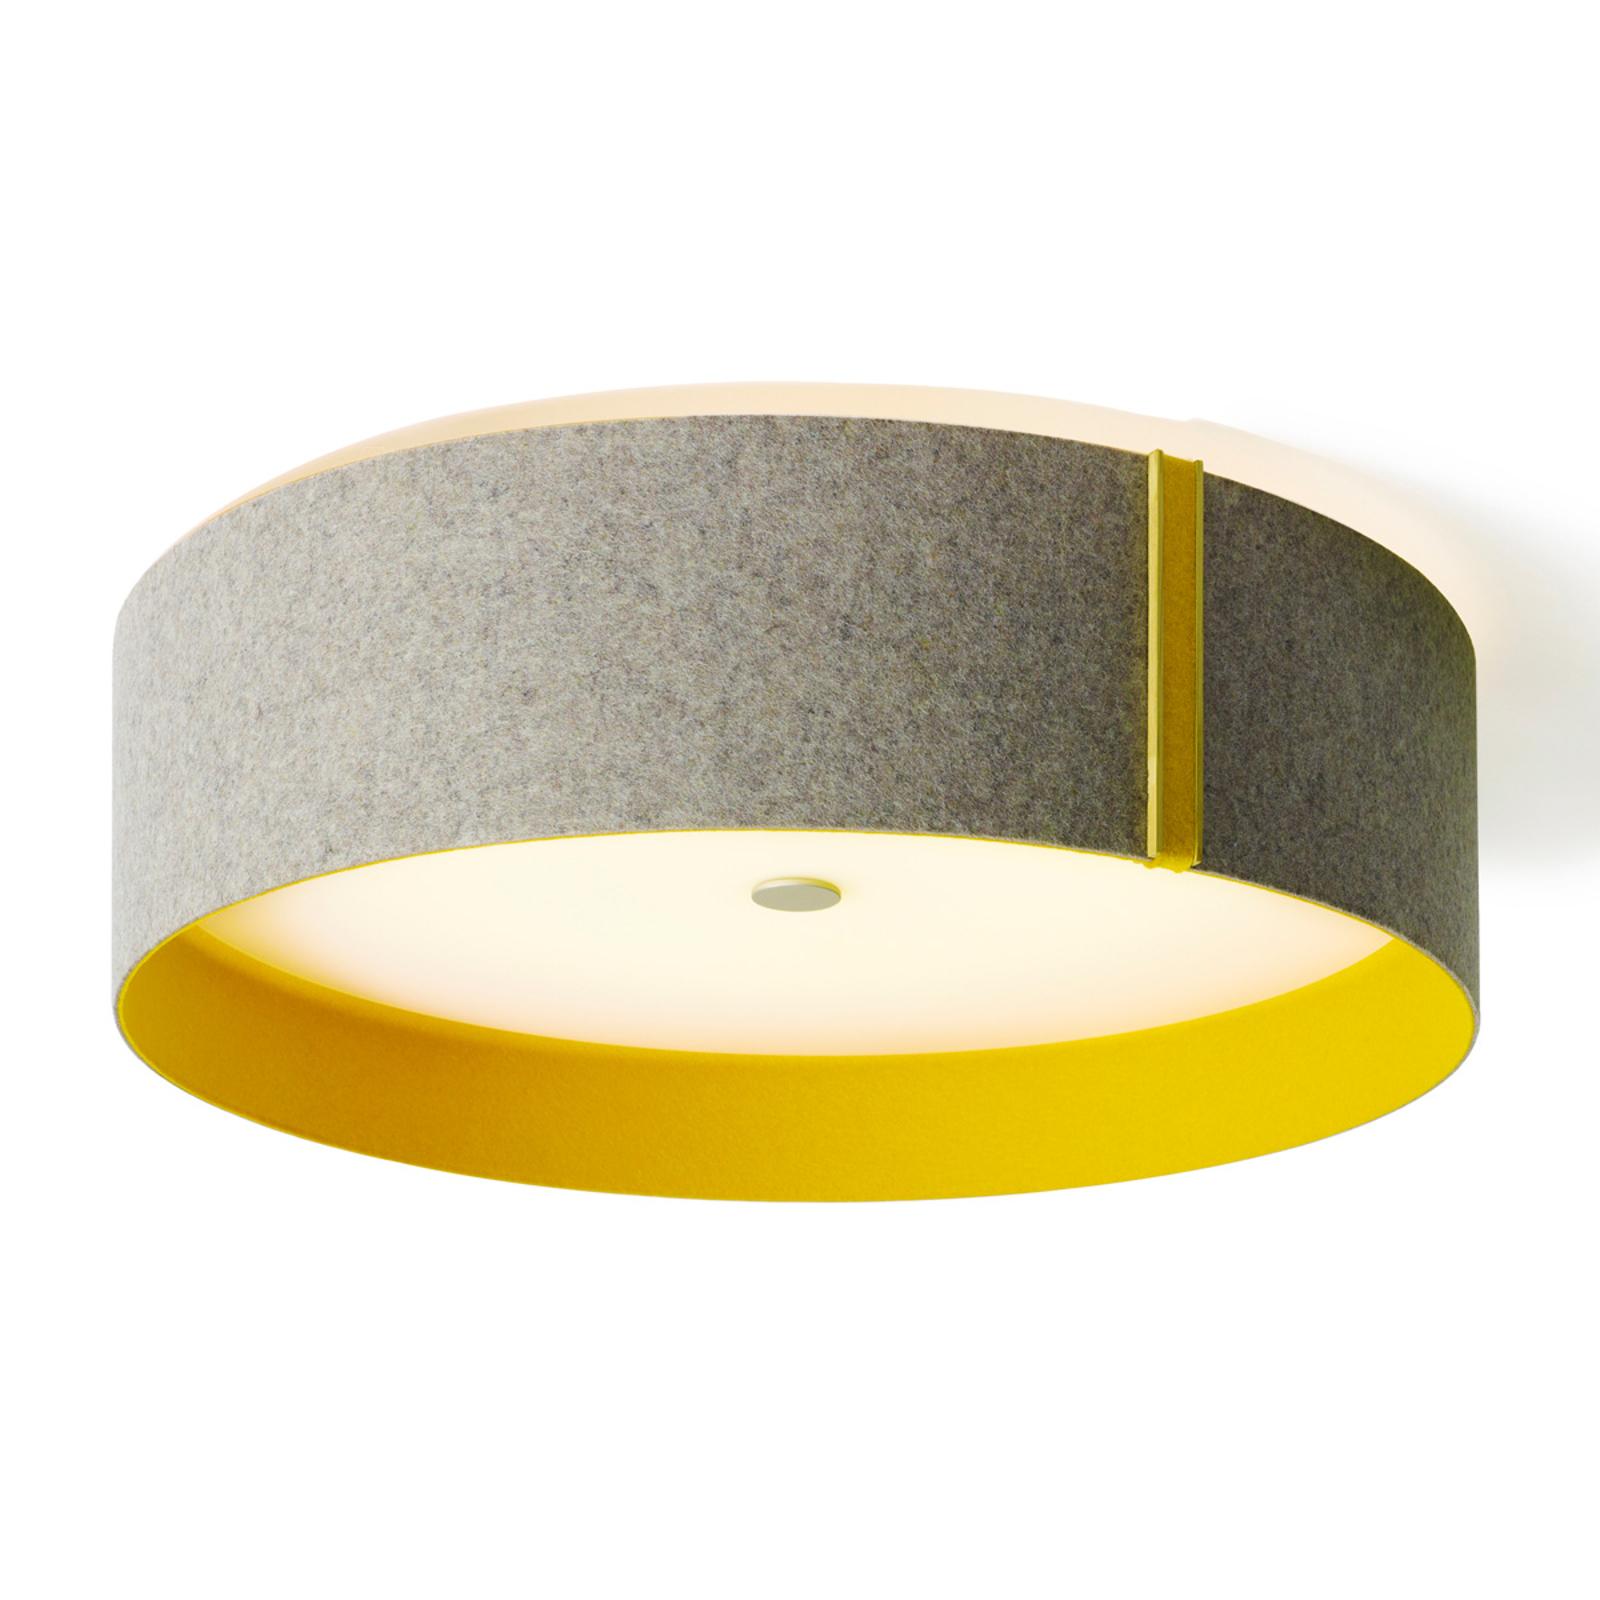 Felt ceiling light Lara felt, LED, grey-curry_2600509_1